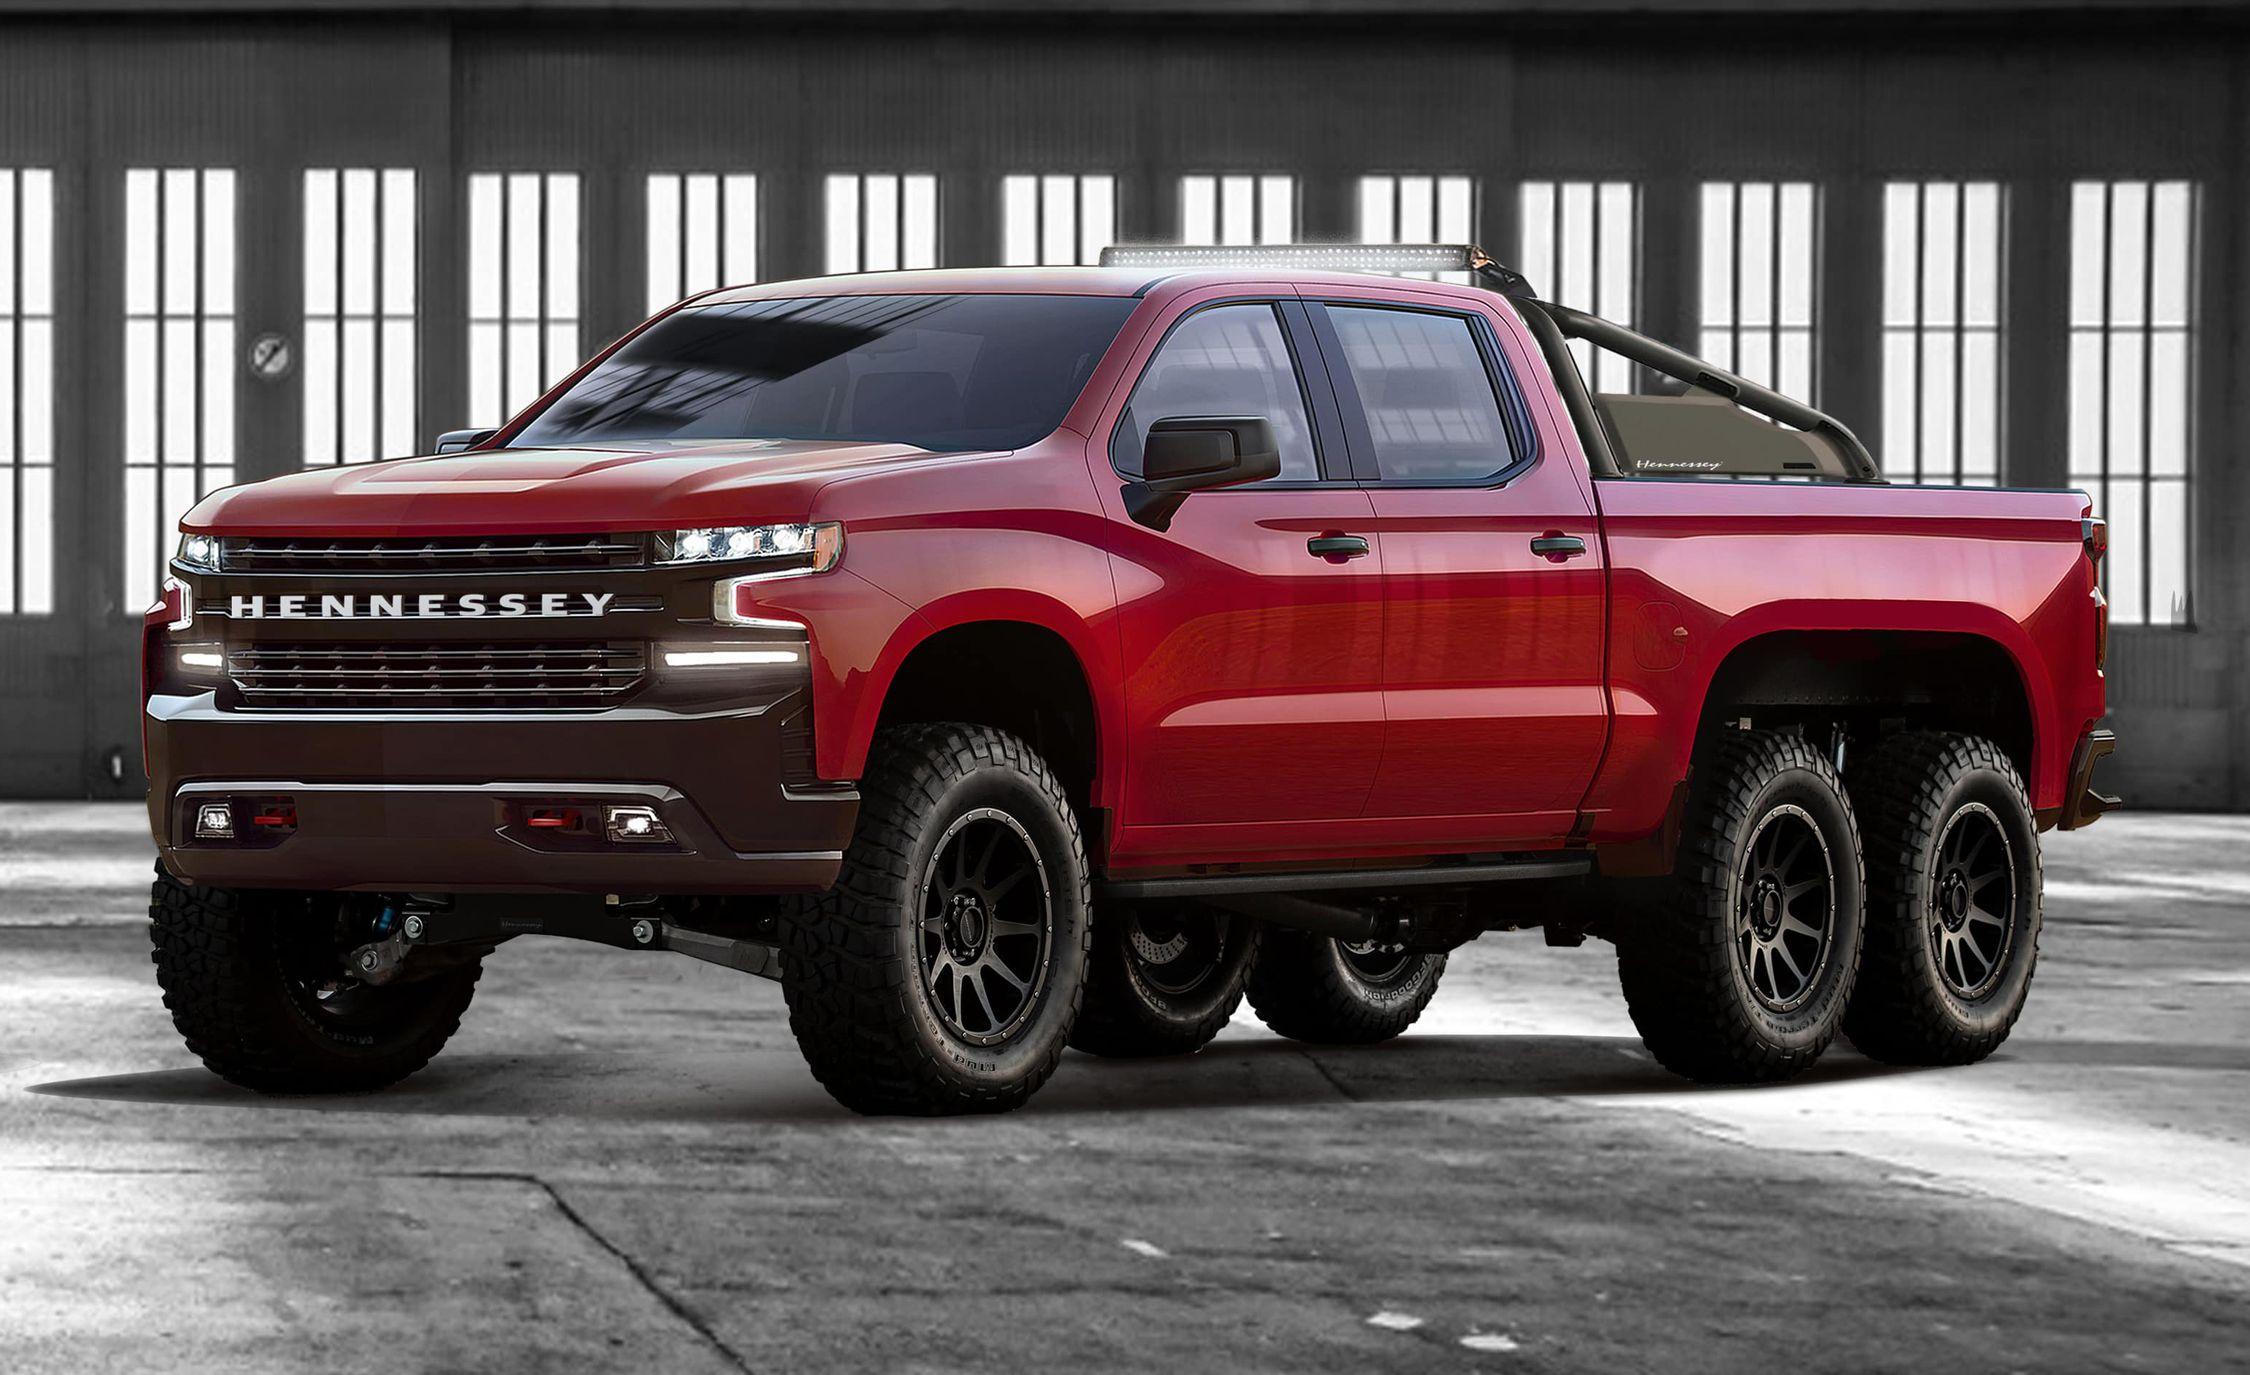 The Hennessey Goliath 6x6 Is a Crazy Six-Wheeled 2019 Chevrolet Silverado